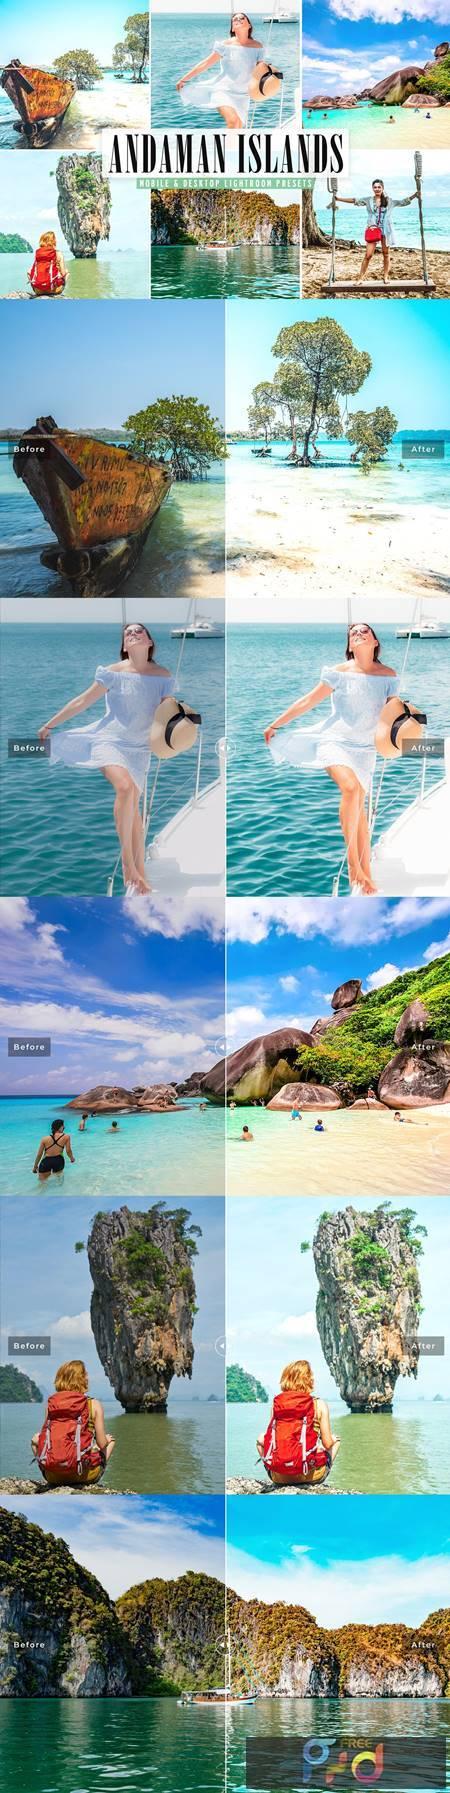 Andaman Islands Pro Lightroom Preset 5448246 1